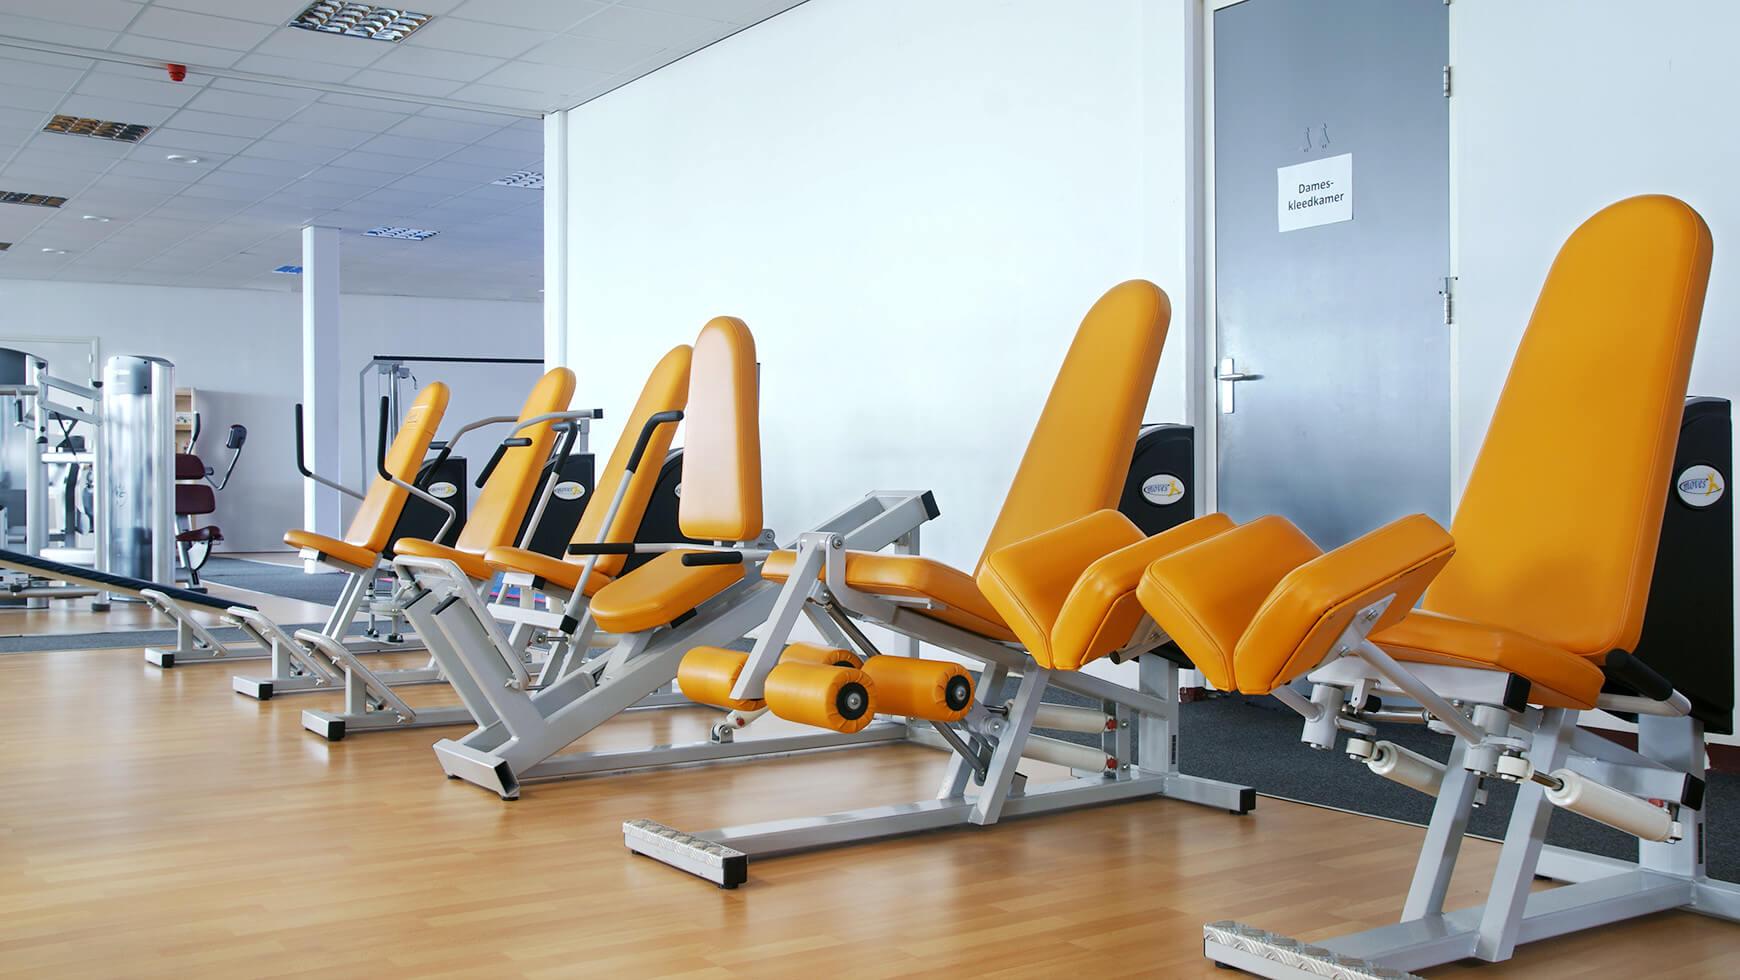 Fitnesstoestellen Sportcentrum Bfit